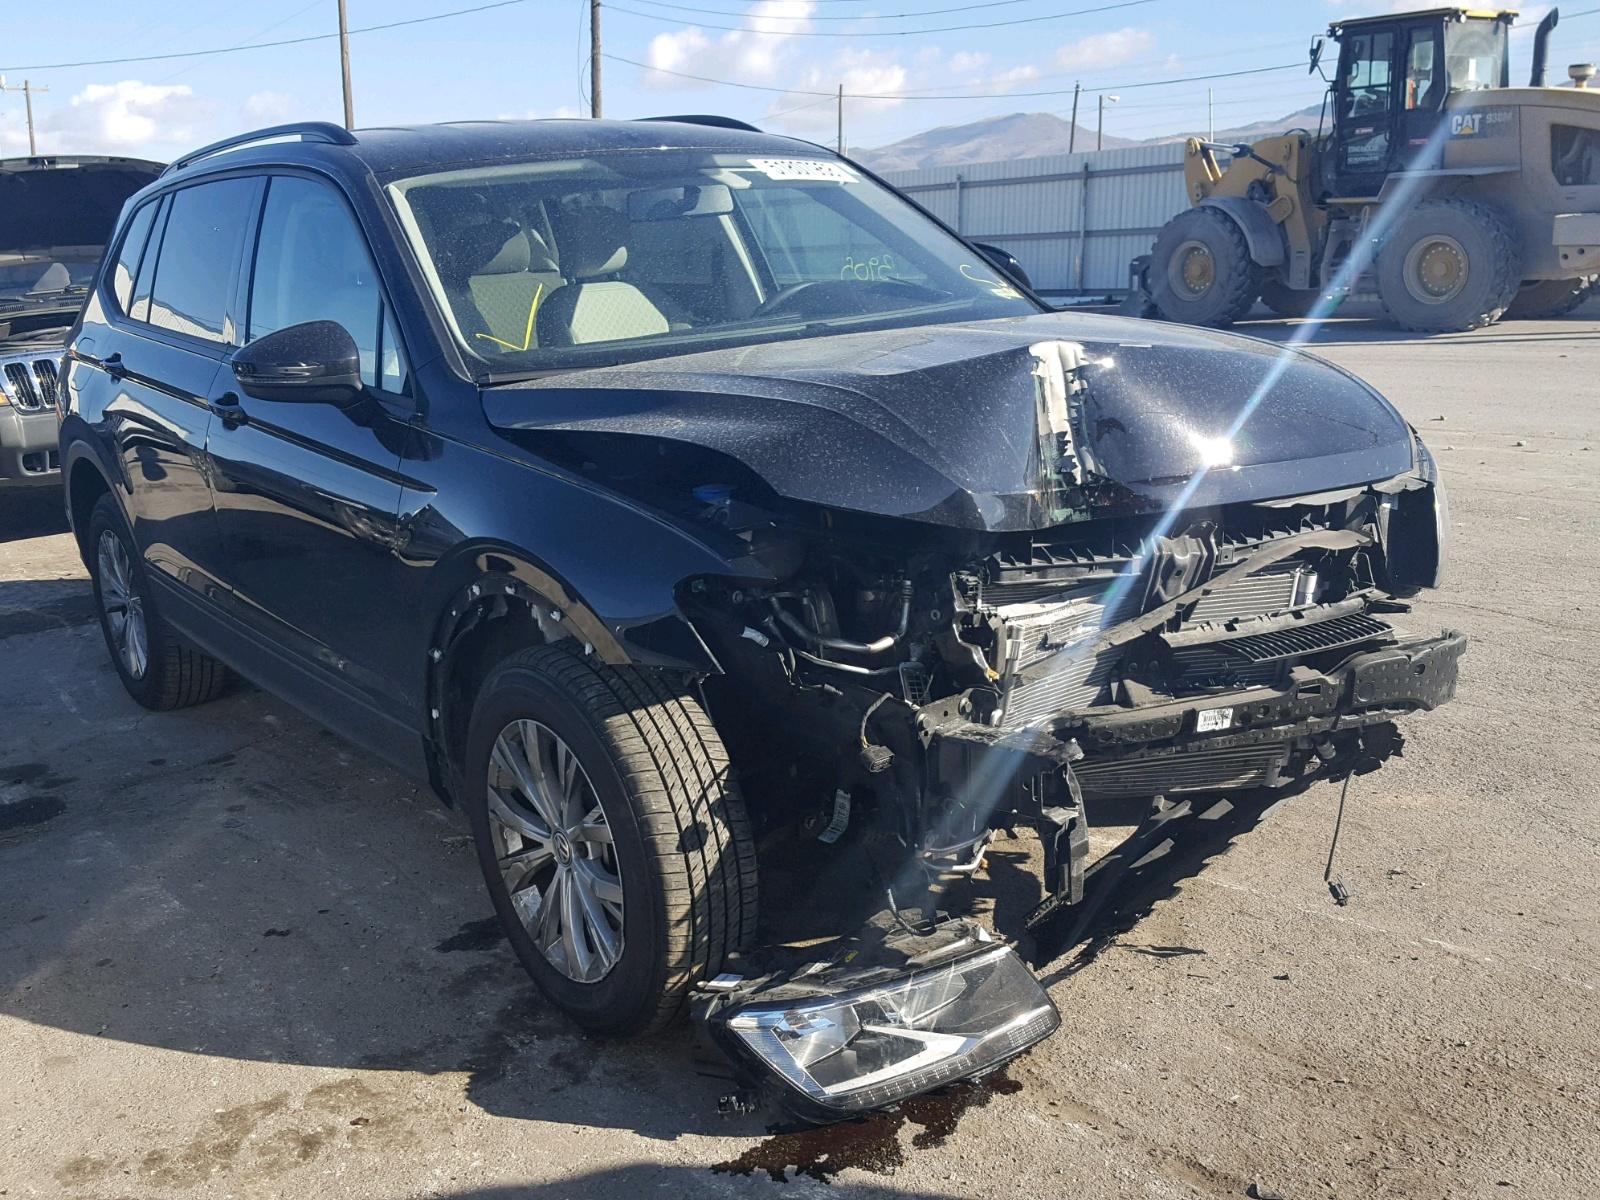 2018 Volkswagen Tiguan S 2 0l 4 In Ut Salt Lake City 3vv0b7ax0jm070385 For